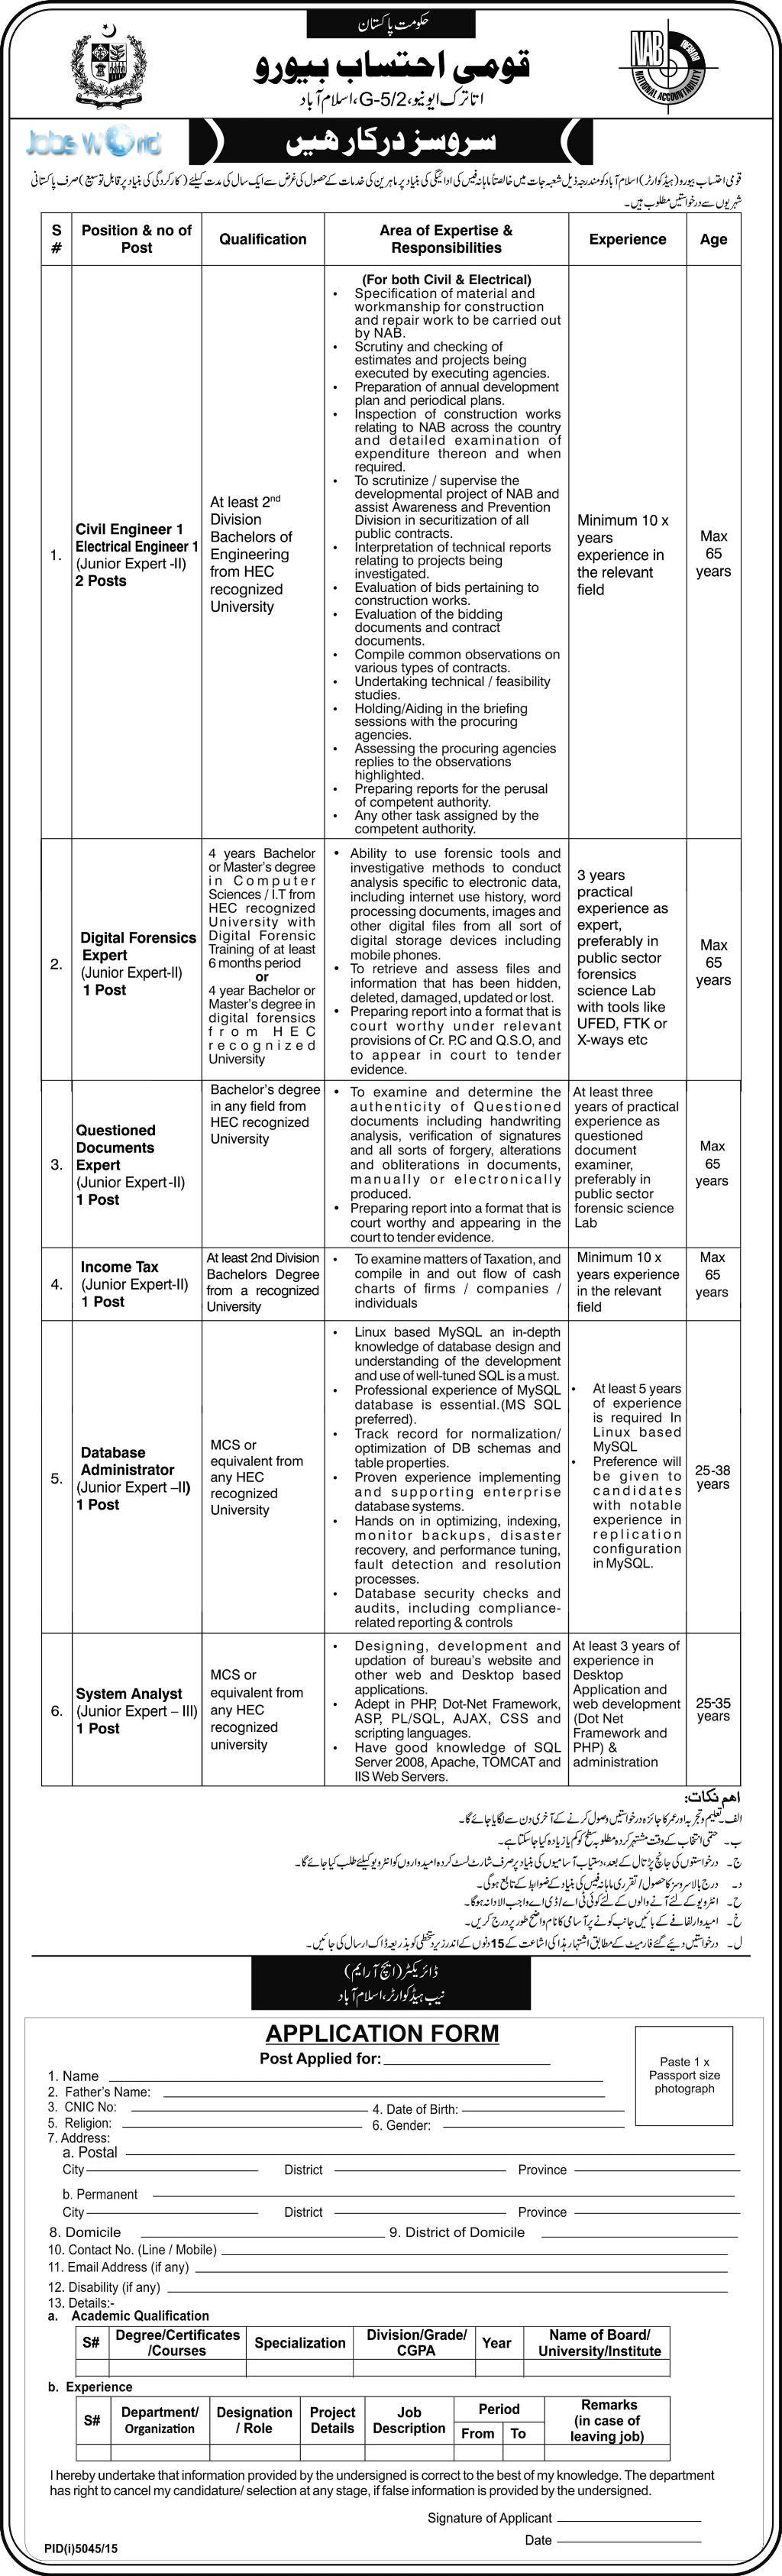 nab jobs for 2016 application form national nab jobs for 2016 application form national accountability bureau